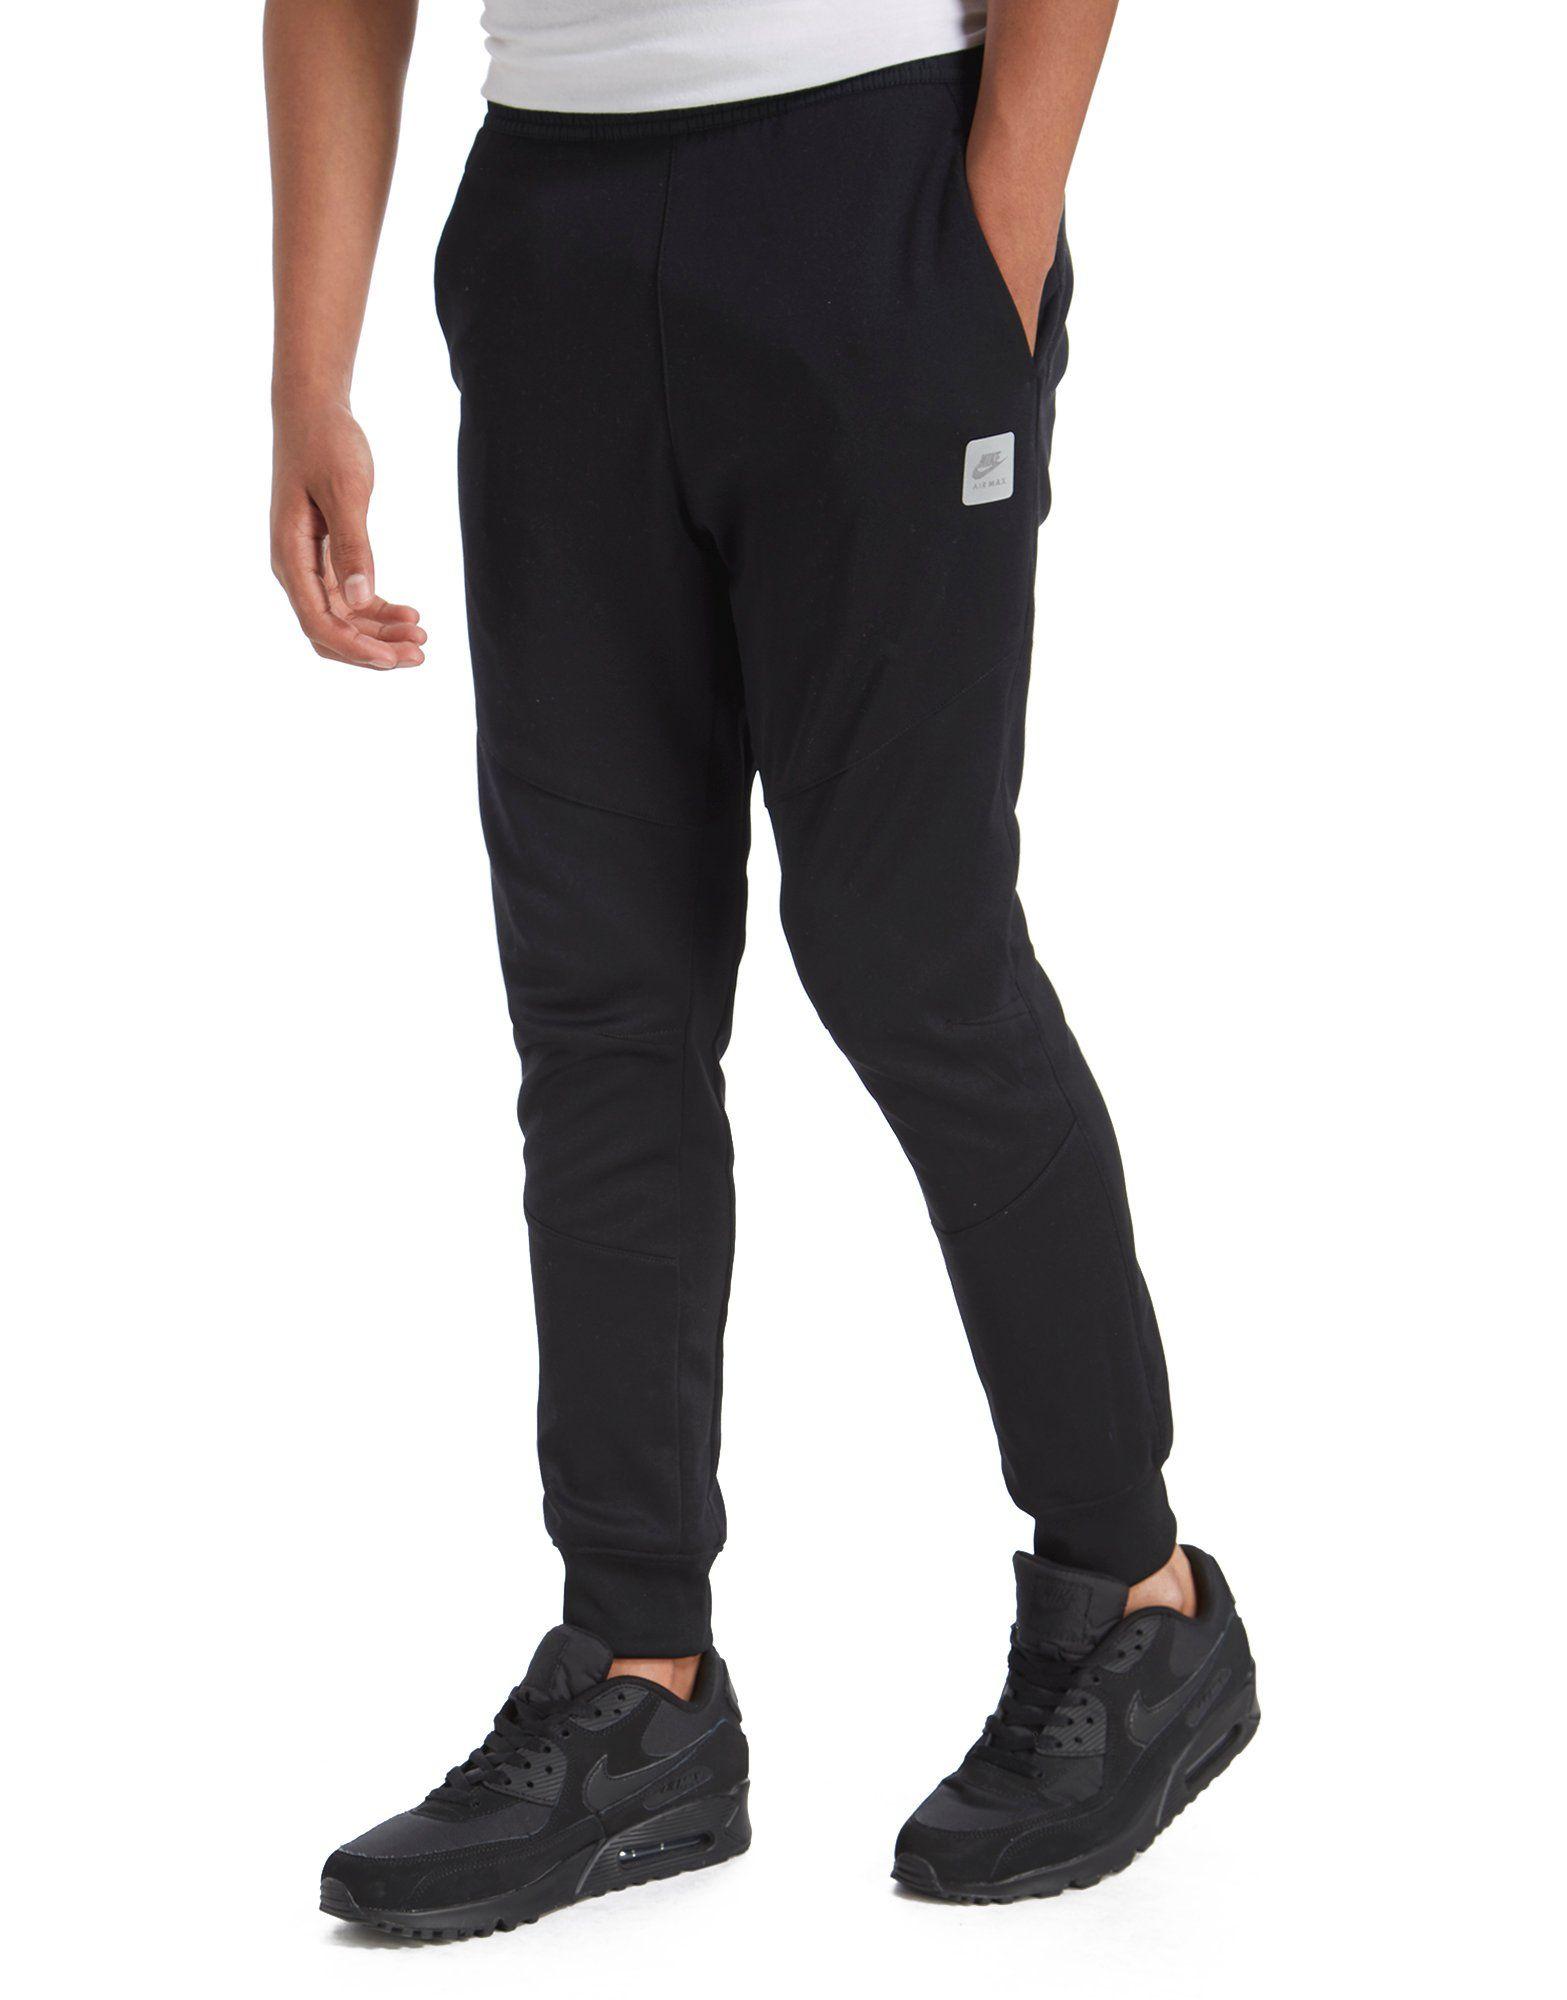 Wonderful 48% Off Nike Air Max Slim Jogging Pants Junior - Grey - Kids - Shopcade Style U0026 Shopping